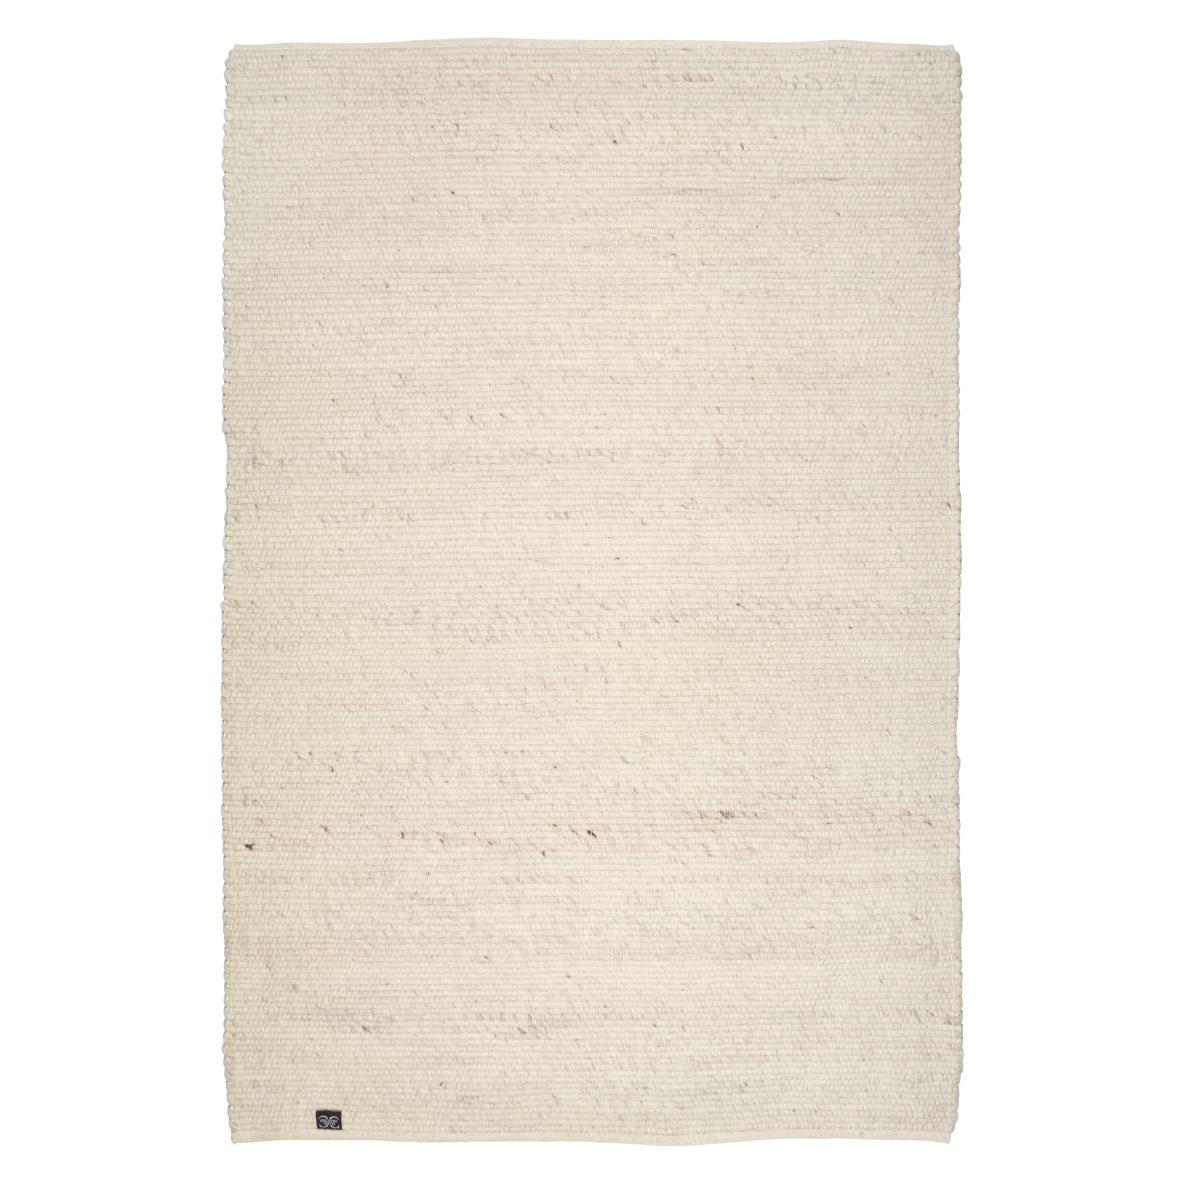 Ullmatta Merino vit 140 x 200 cm Classic Collection